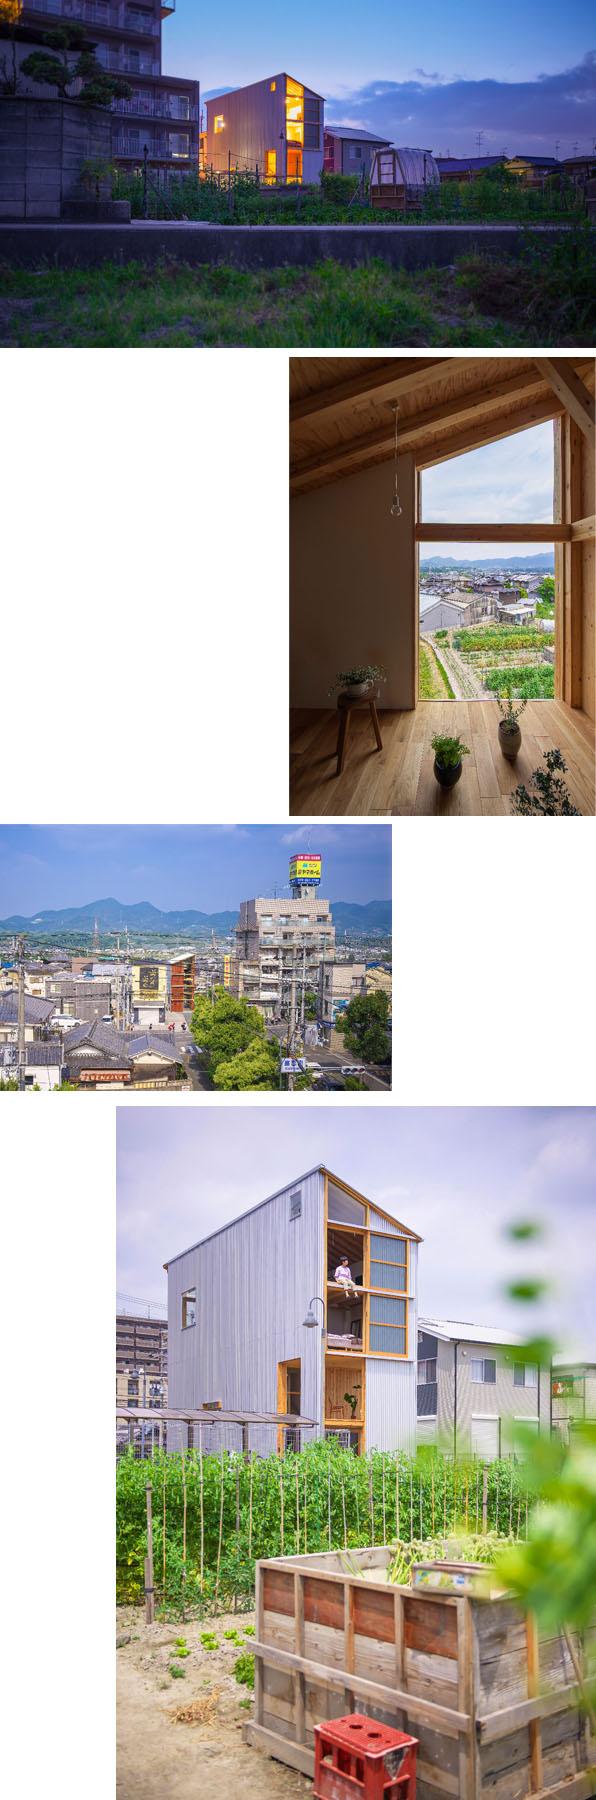 casa museo de la ceramica house-pottery-casa-ceramica-madera-japon-japan-modusvivendiarquitectura-modusvivendi-blog-modus-vivendi-arquitectura-architecture-01